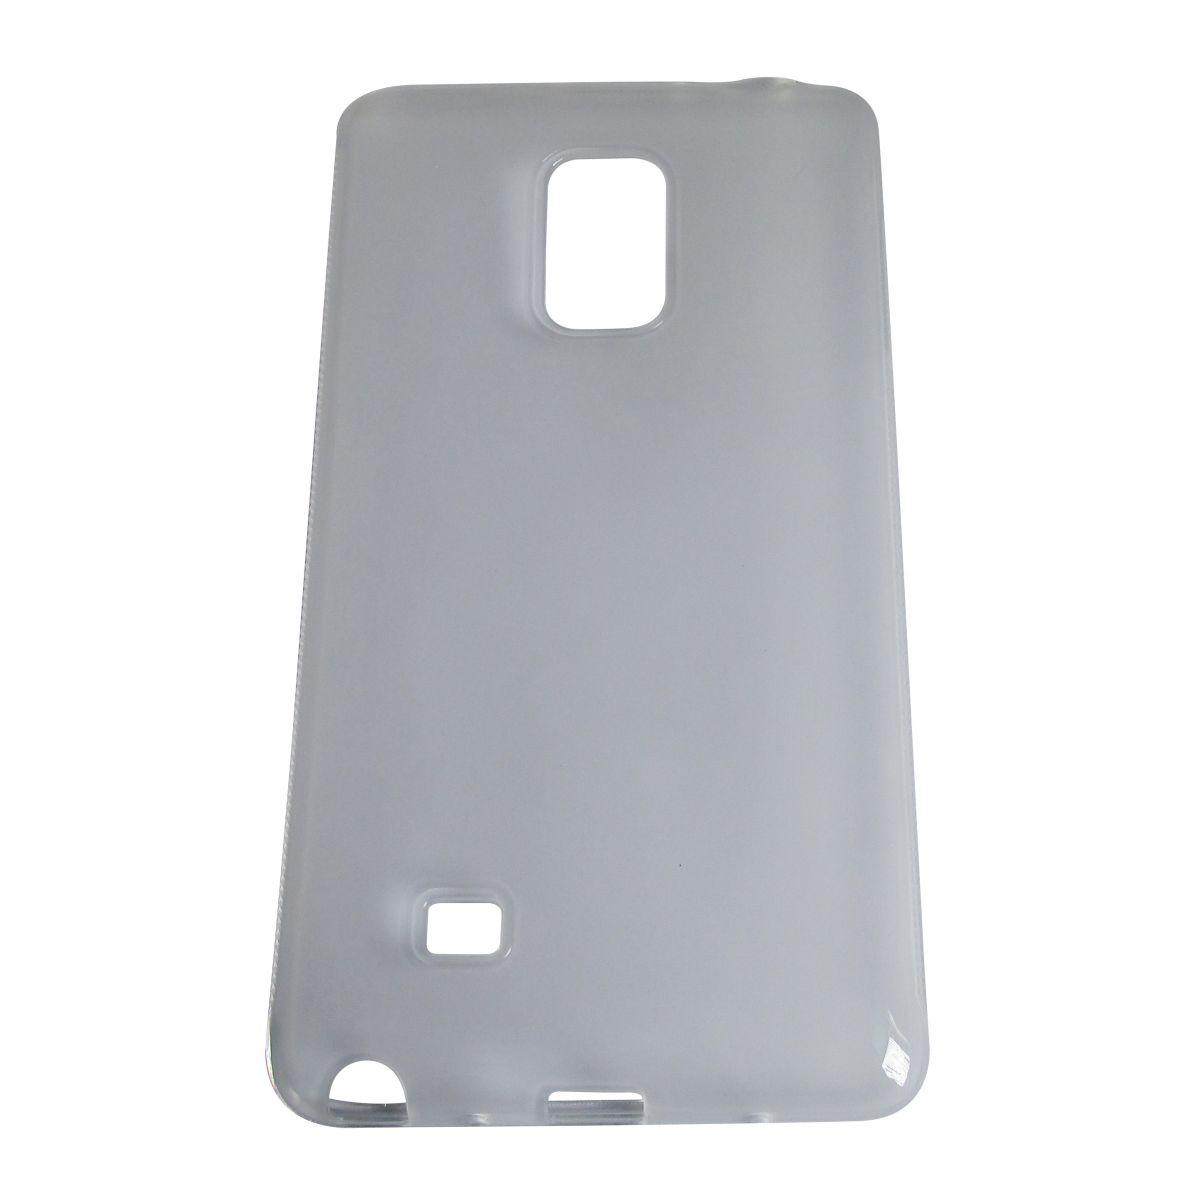 Capa TPU Transparente Samsung Galaxy Note Edge